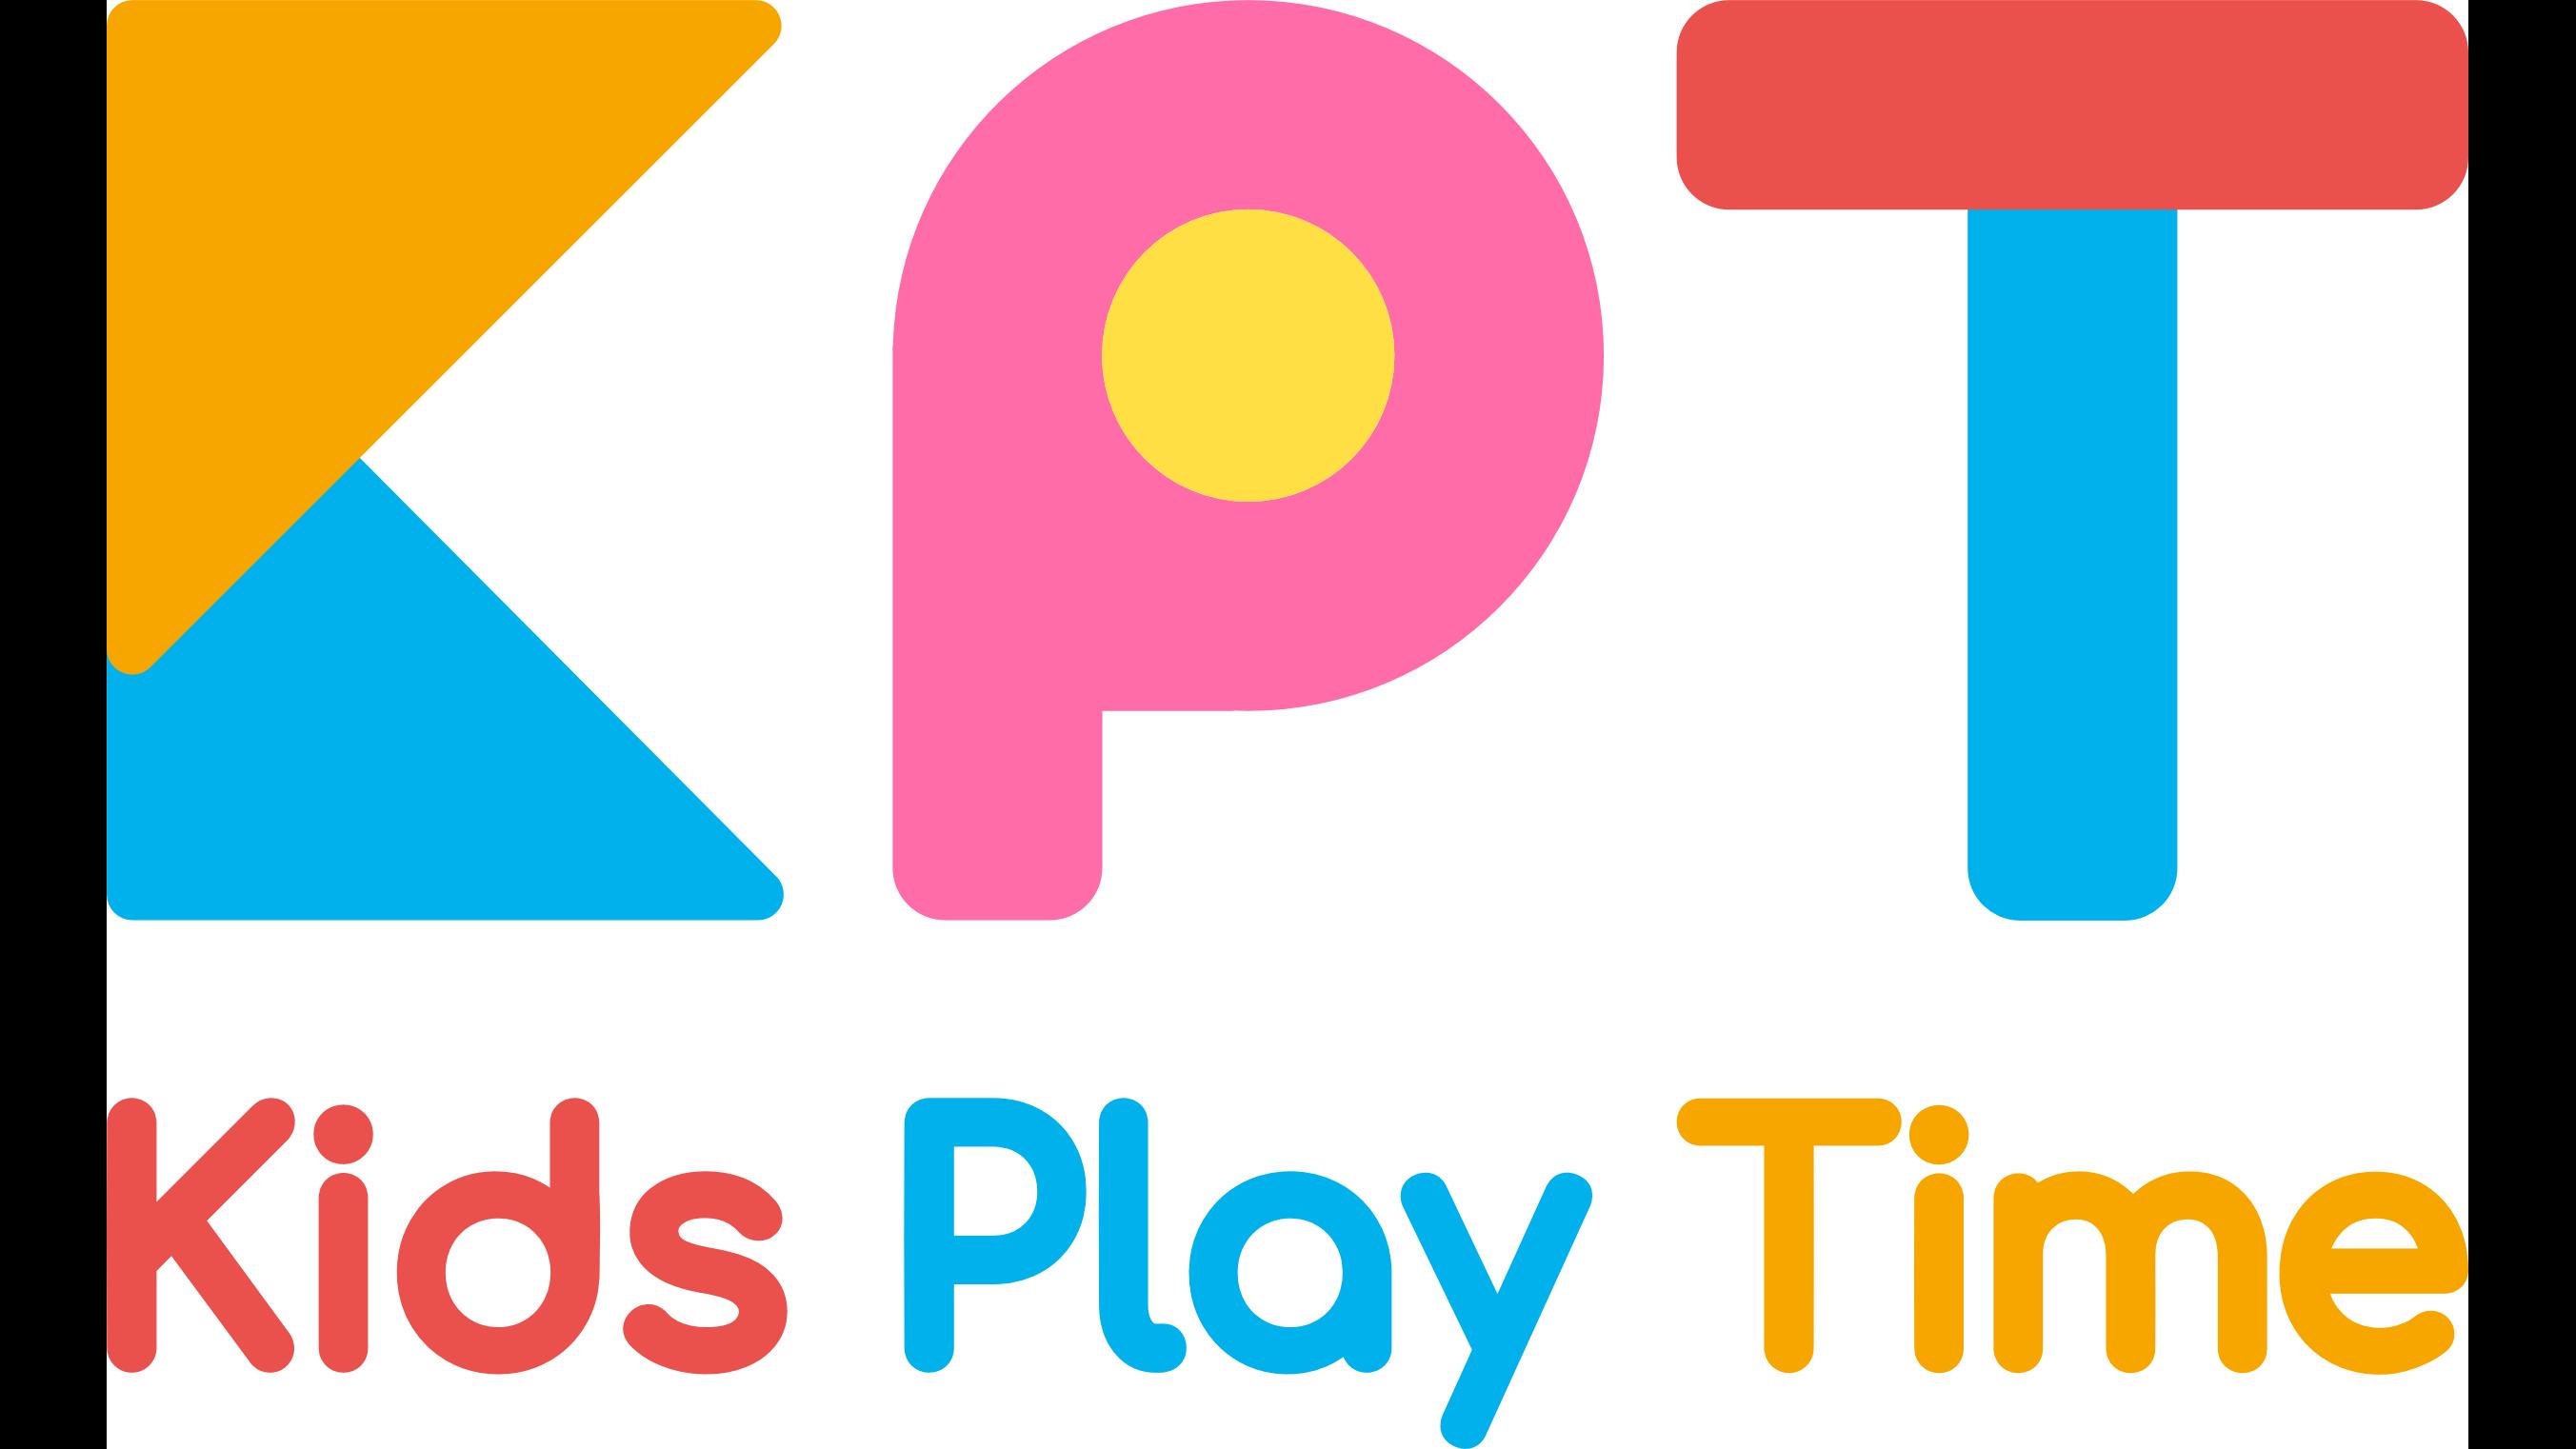 Kids Play Time